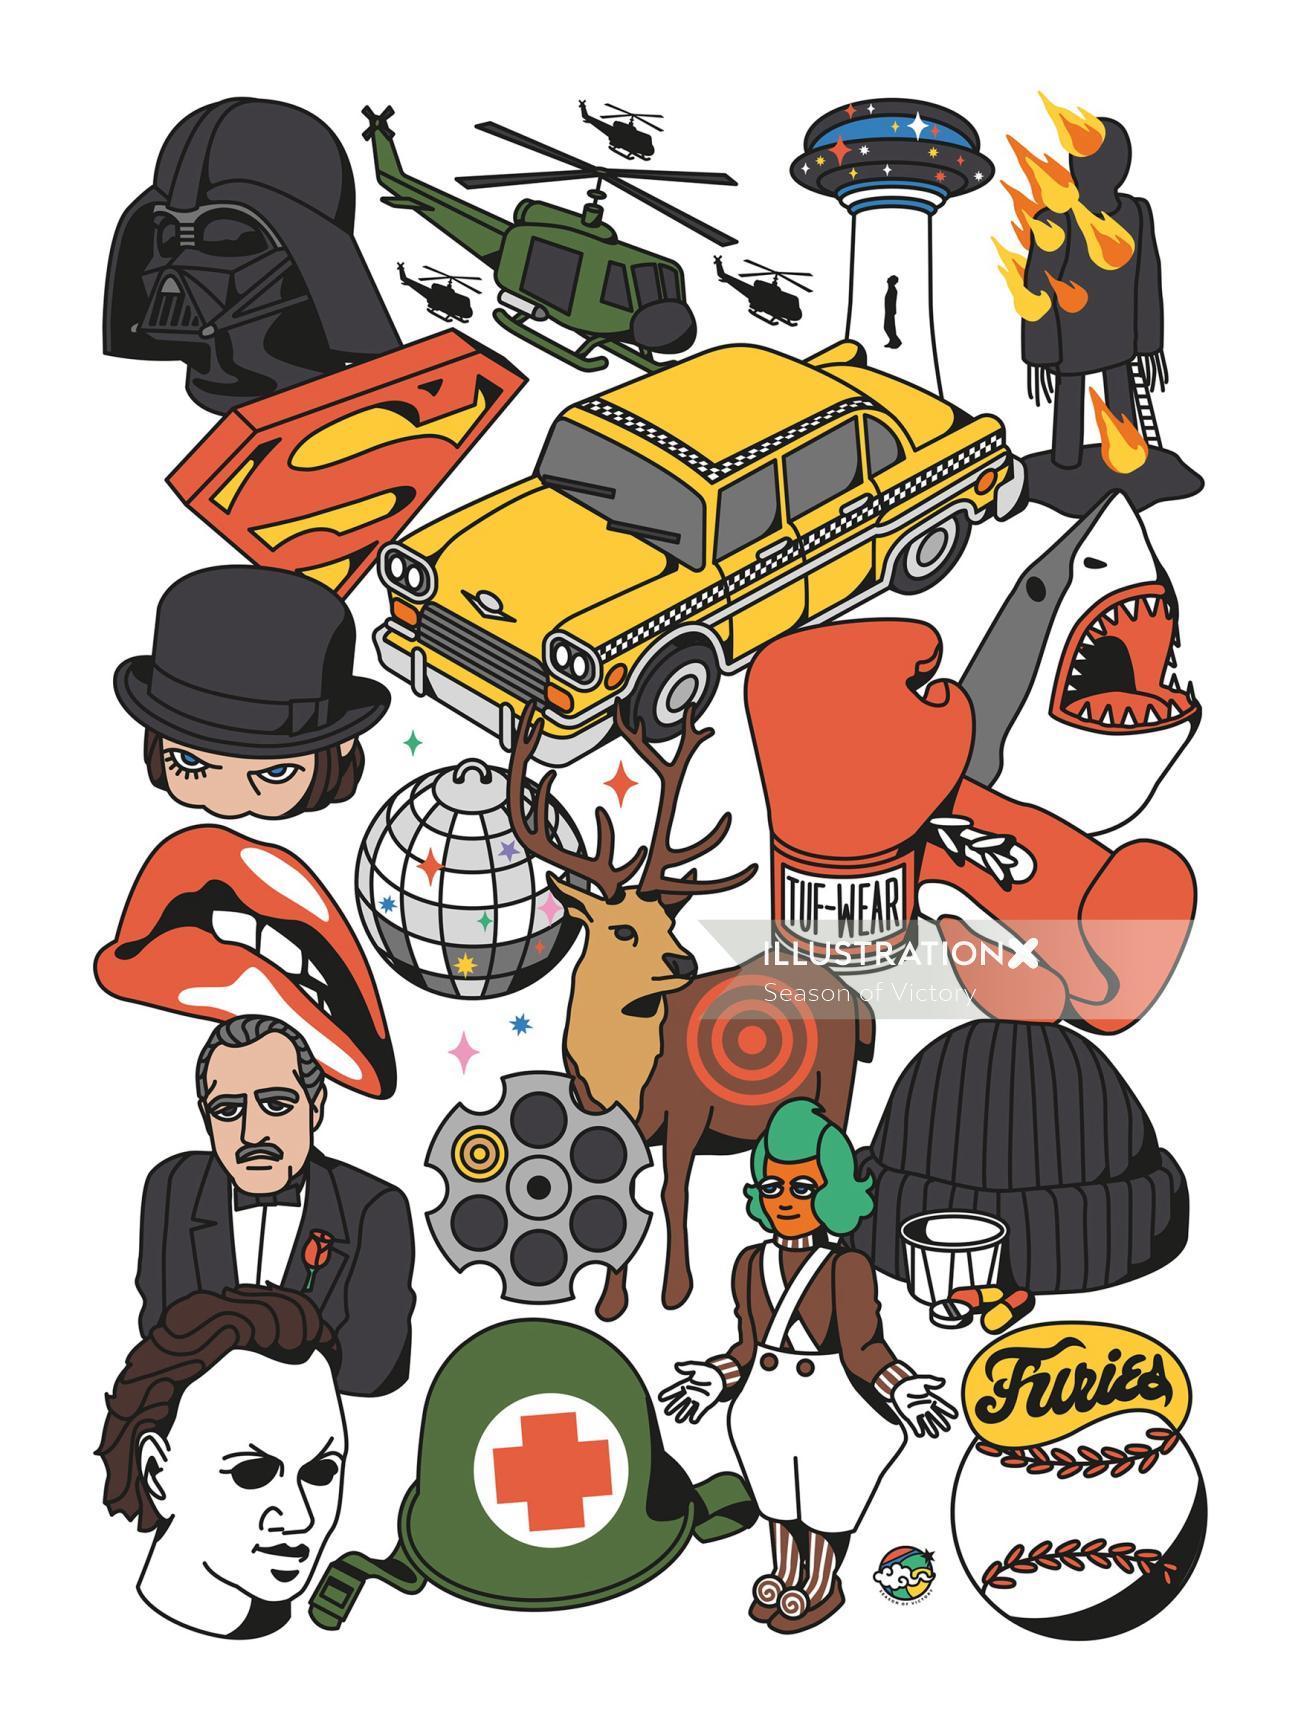 isometric illustration, isometric, 80s, 90s, humour, films, entertainment, movies, Netflix, cars, se